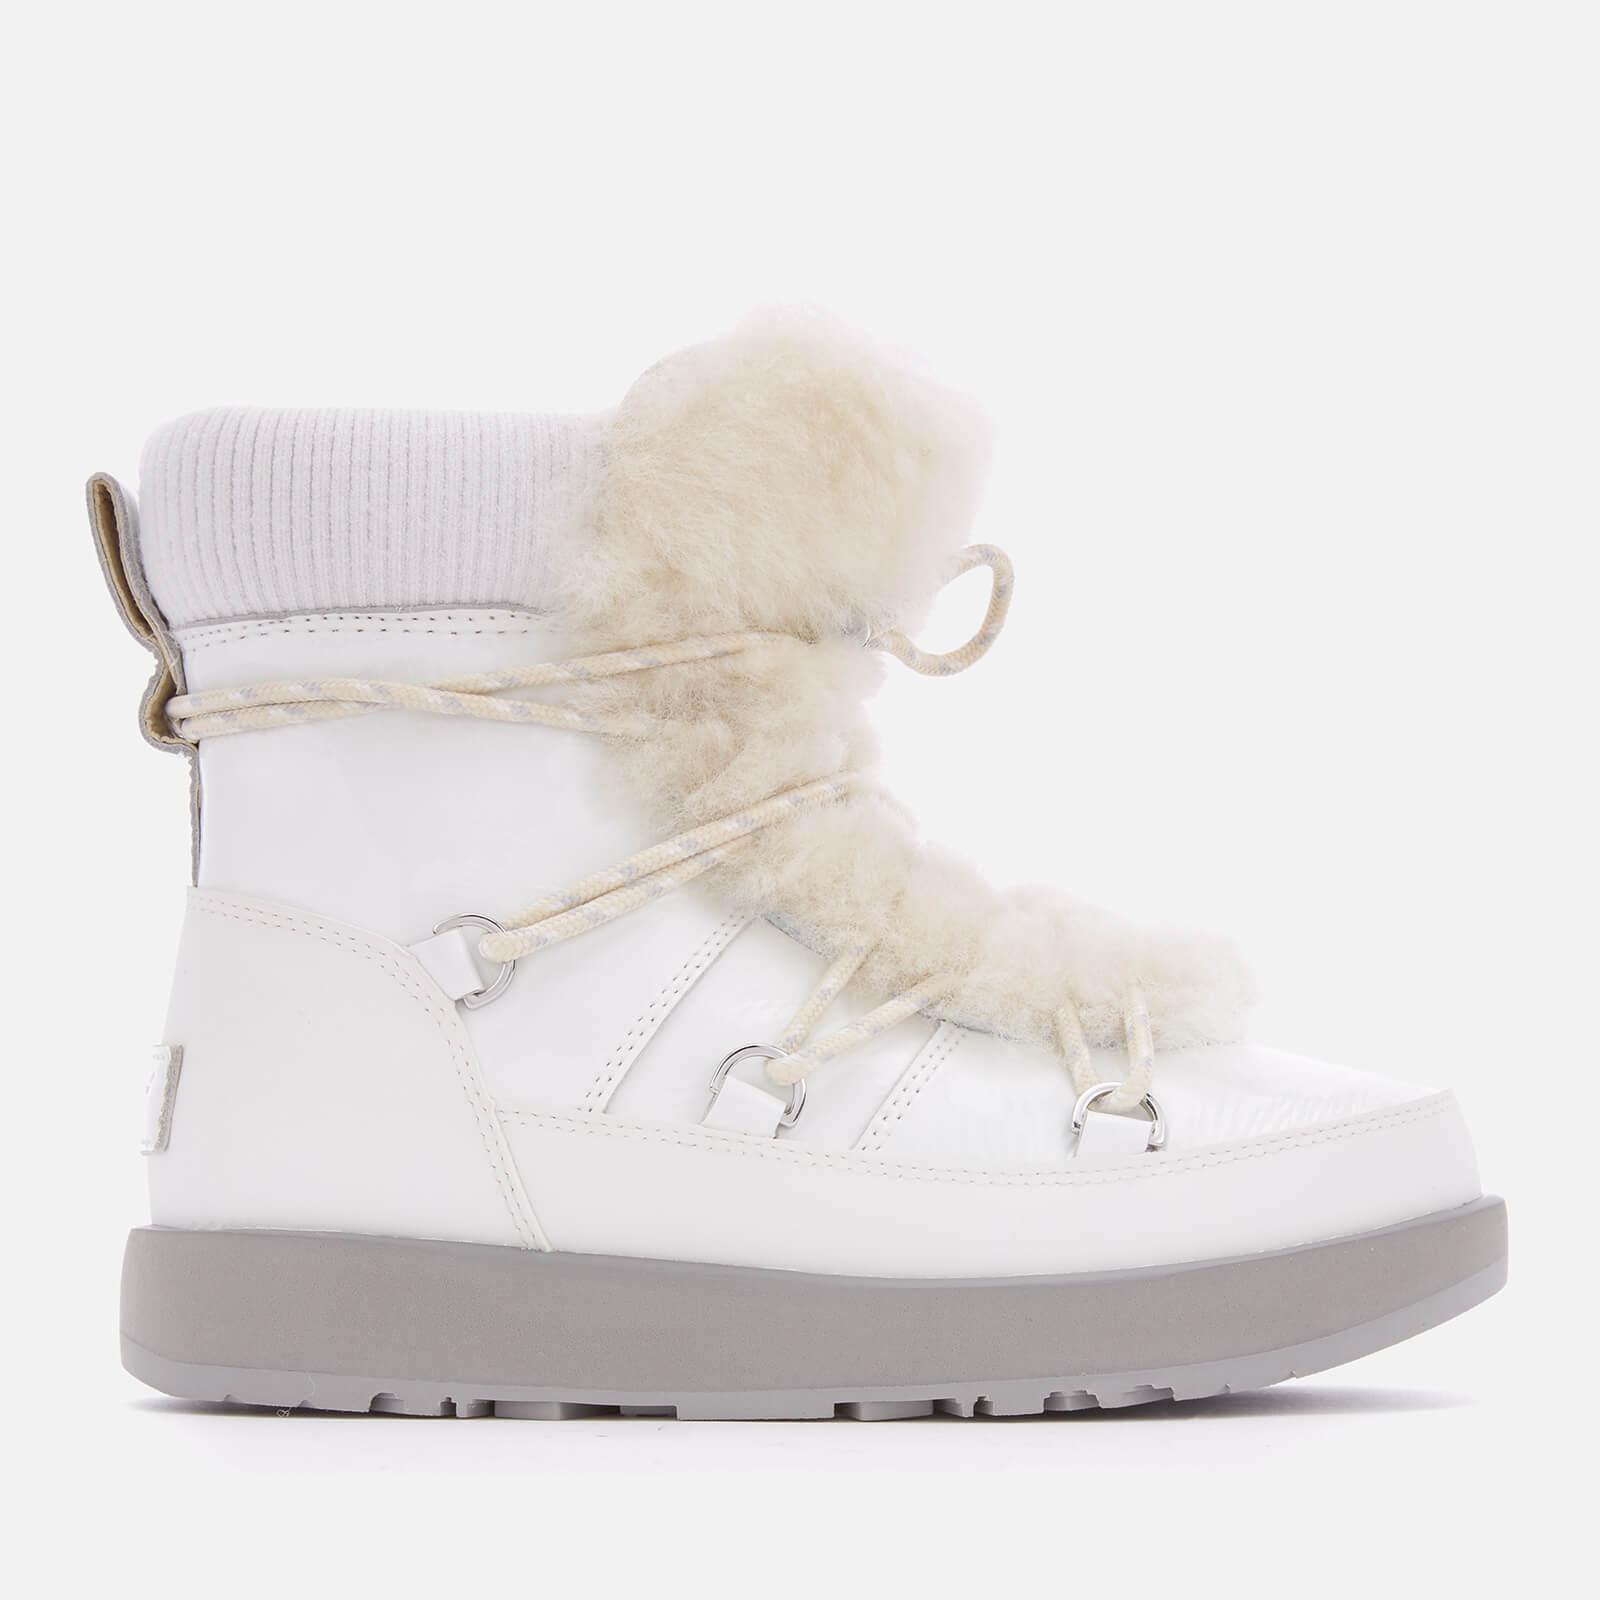 30aaf27ea23 UGG Women's Highland Waterproof Boots - White